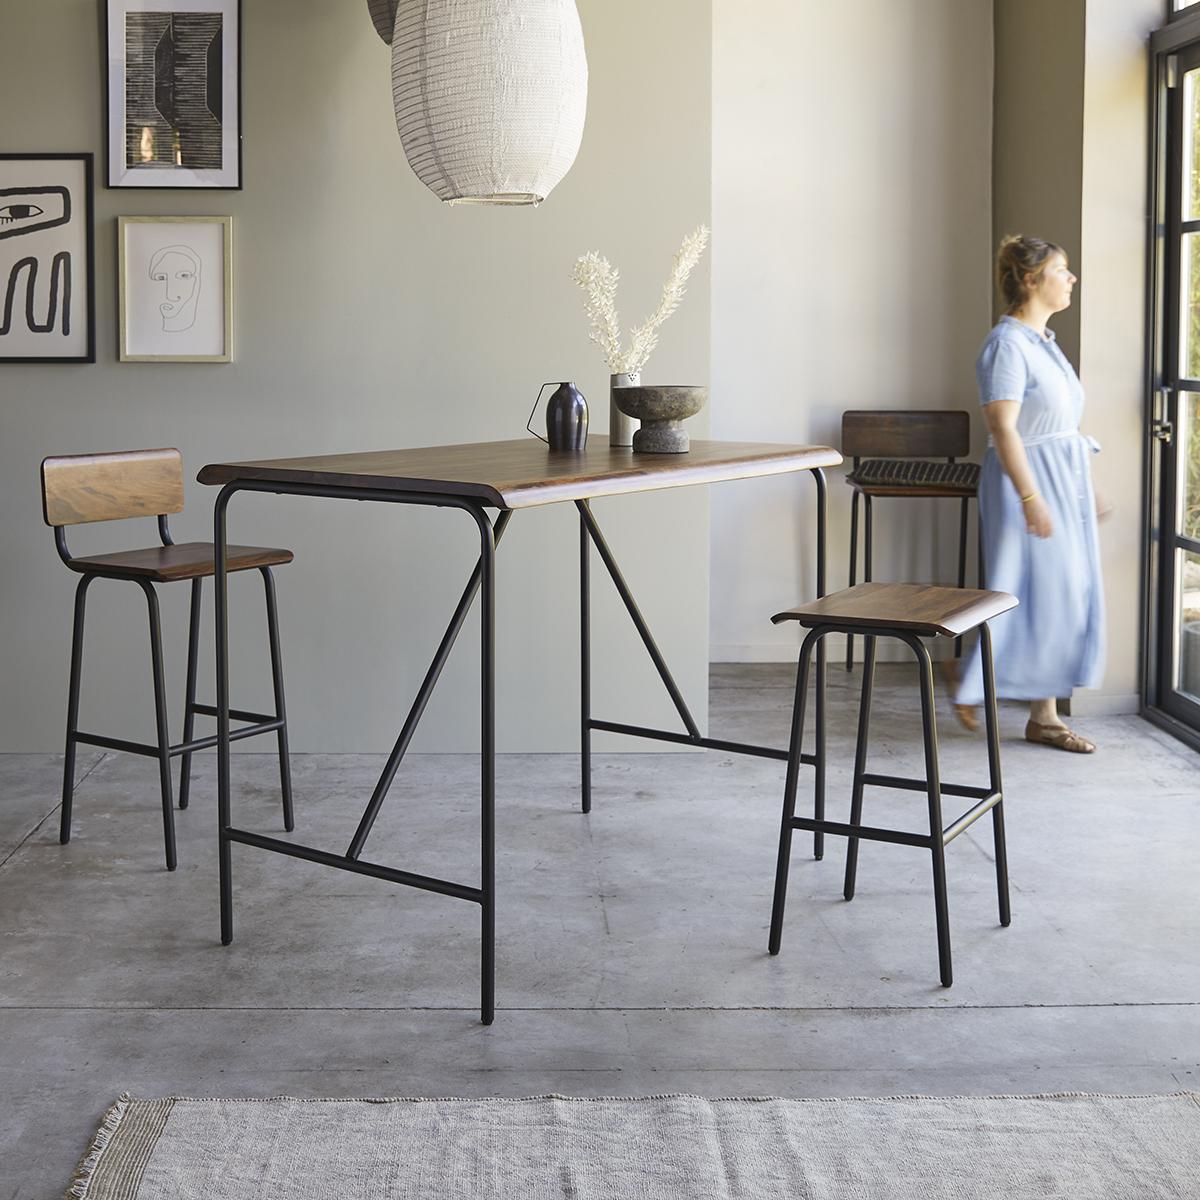 Mesa alta en palisandro macizo y metal Talia 4 pers.